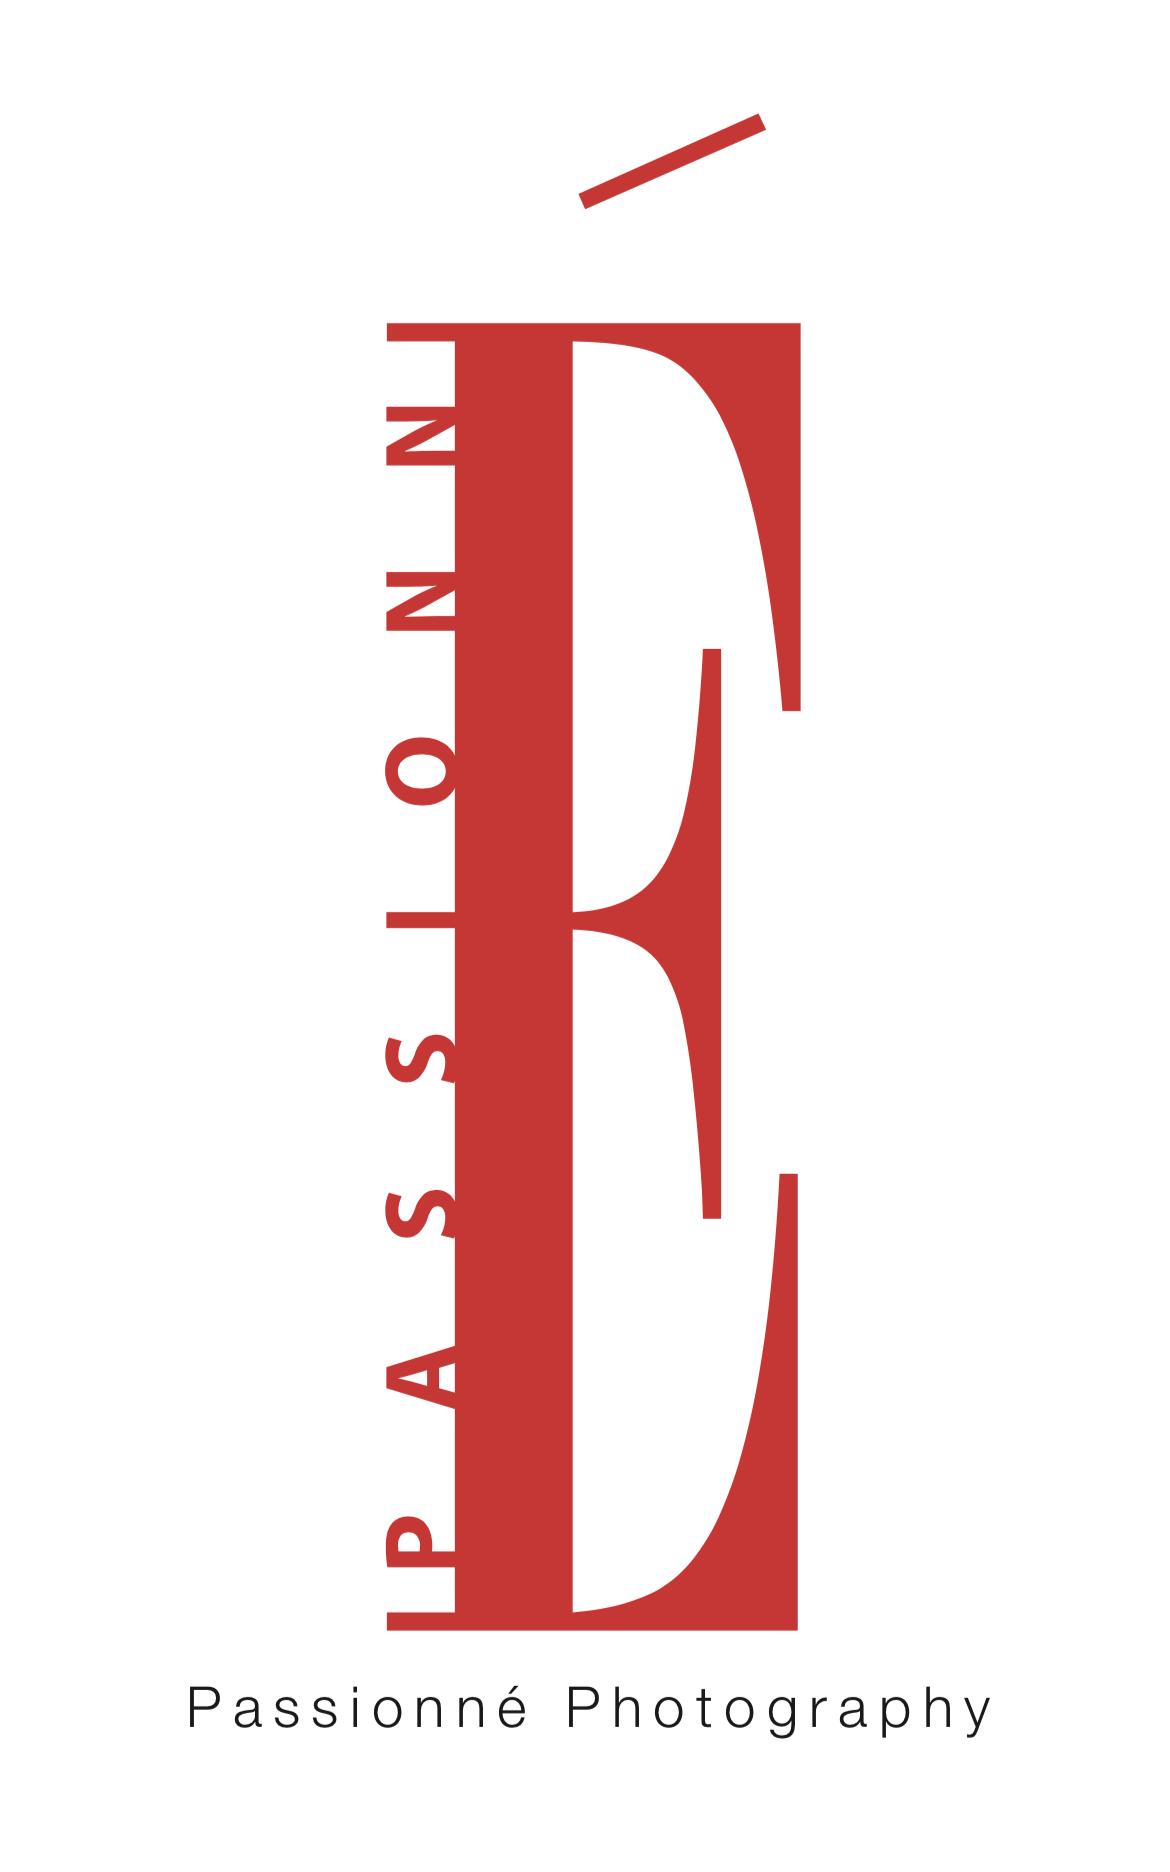 Passionné Photography Logo